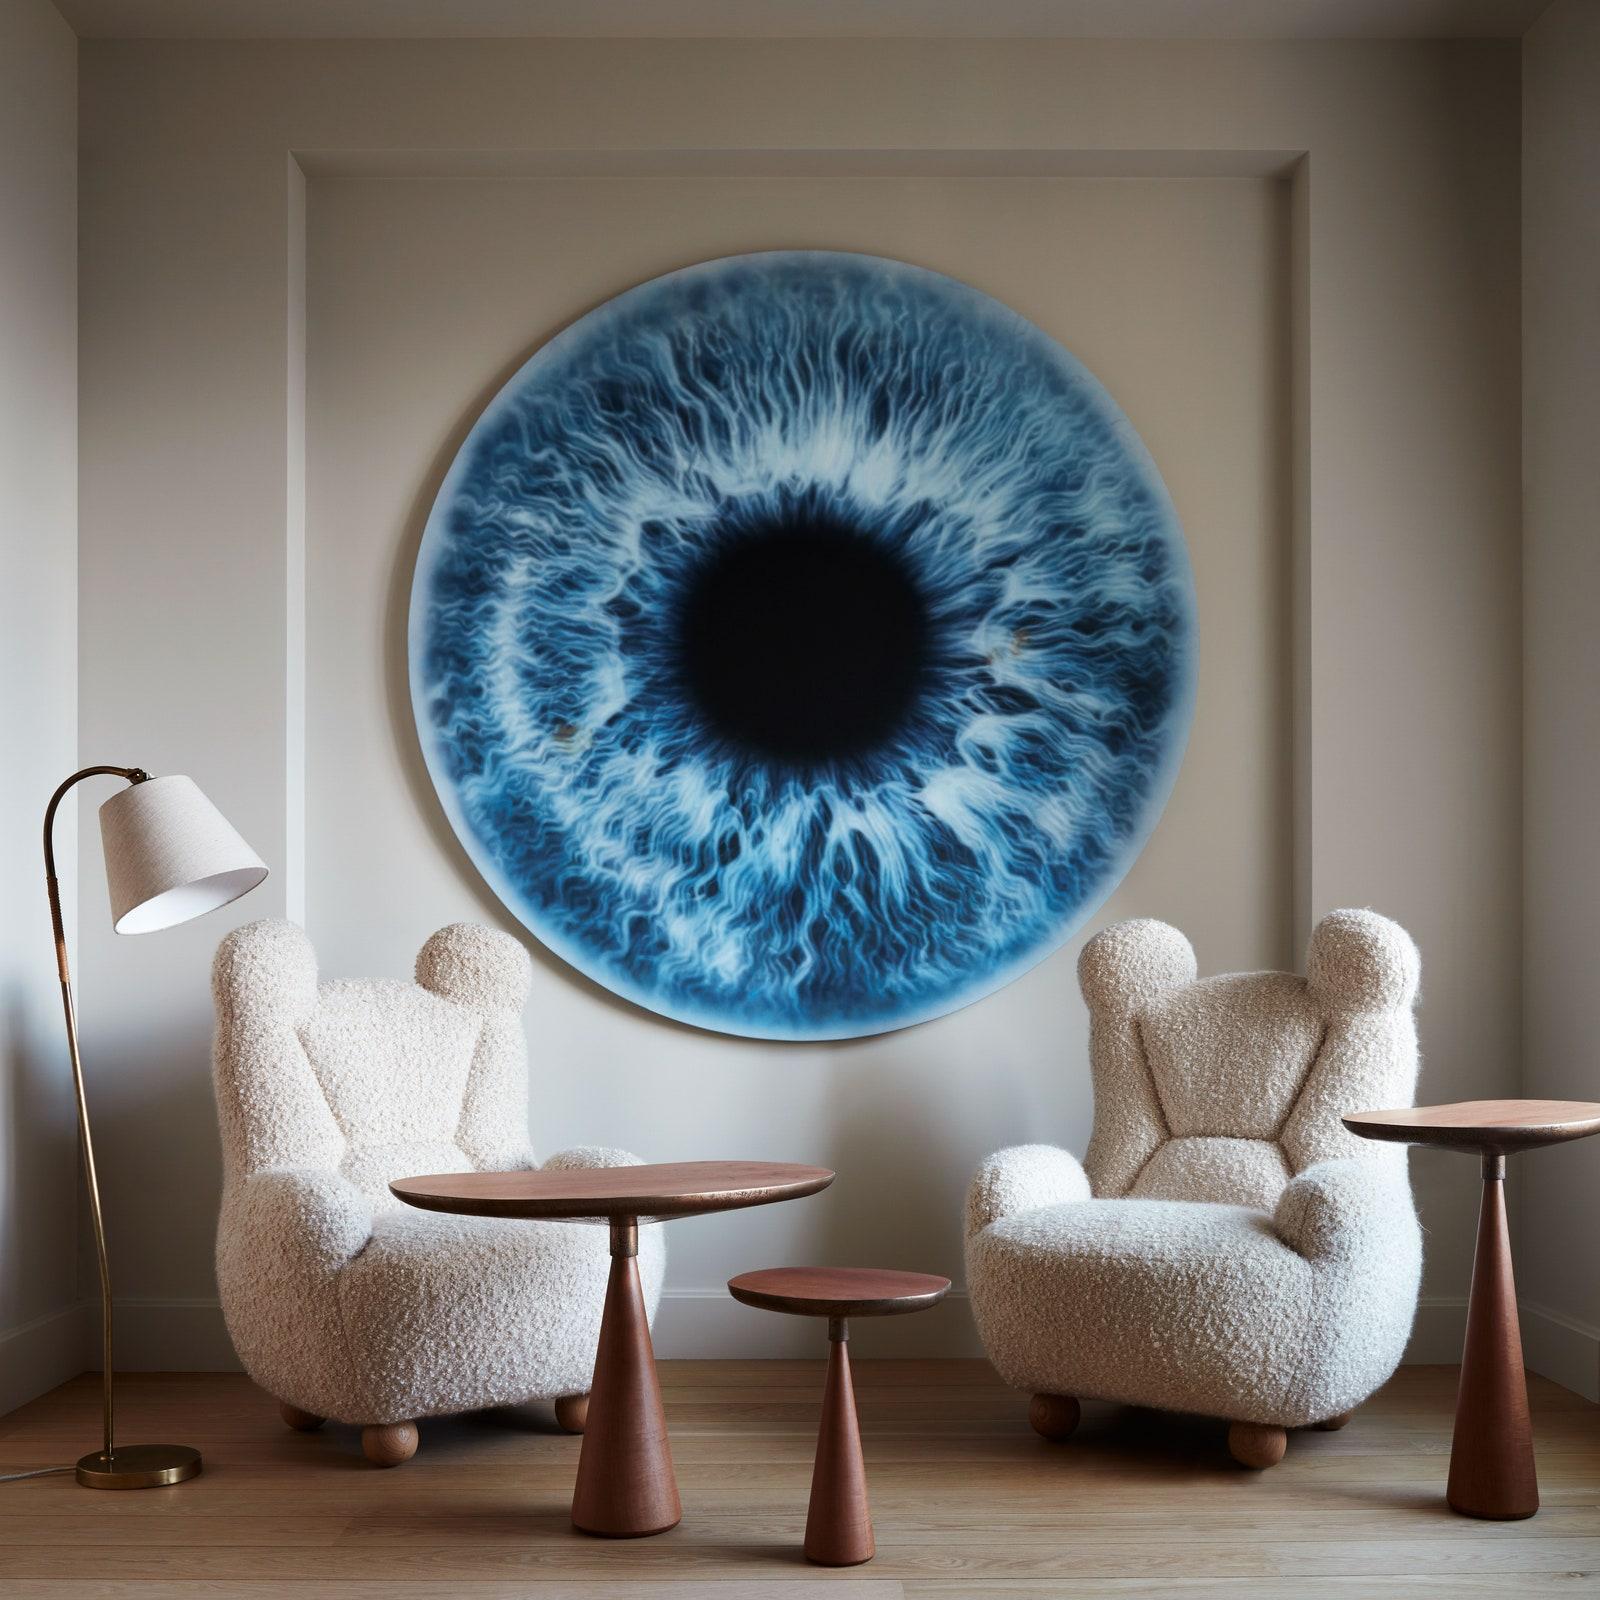 Paris Interior Designers: The Top 10 paris interior designers Paris Interior Designers: The Top 10 Inspirations for Modern Chairs pierre yovanovitch